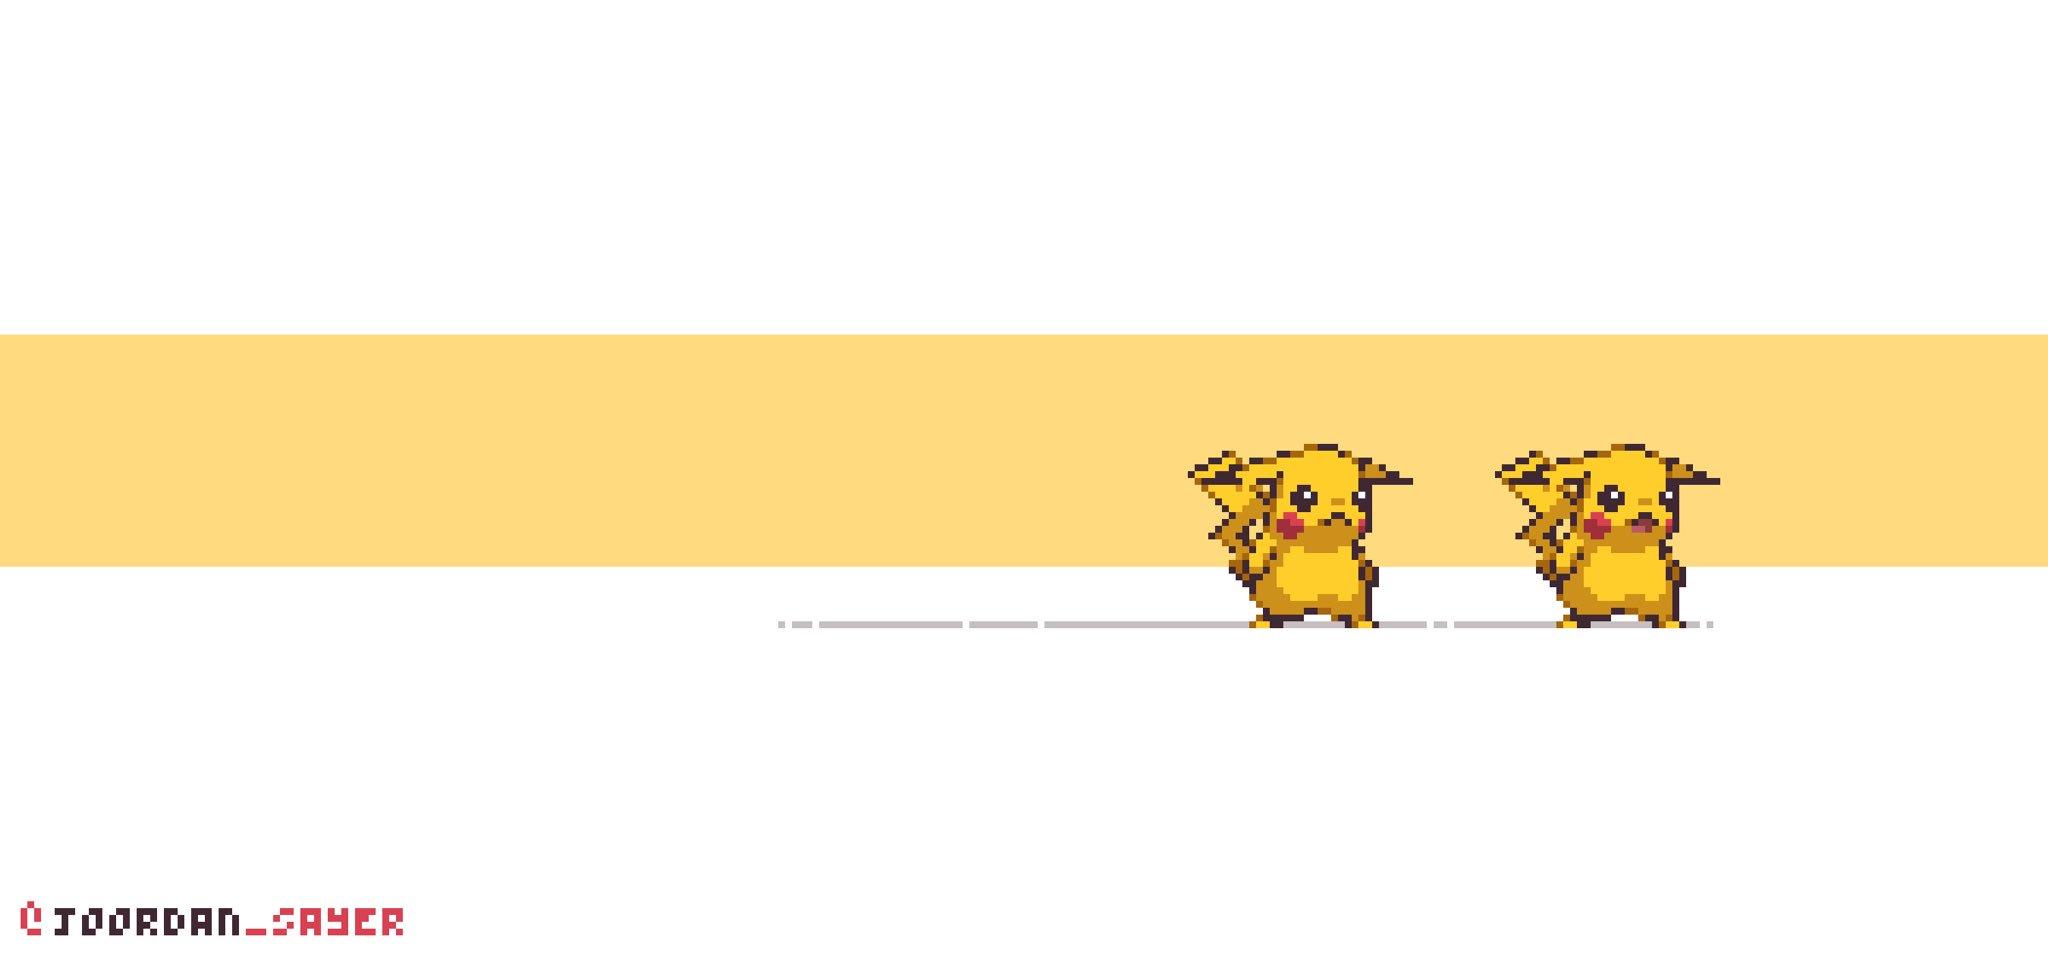 pikachu_showcase.jpg